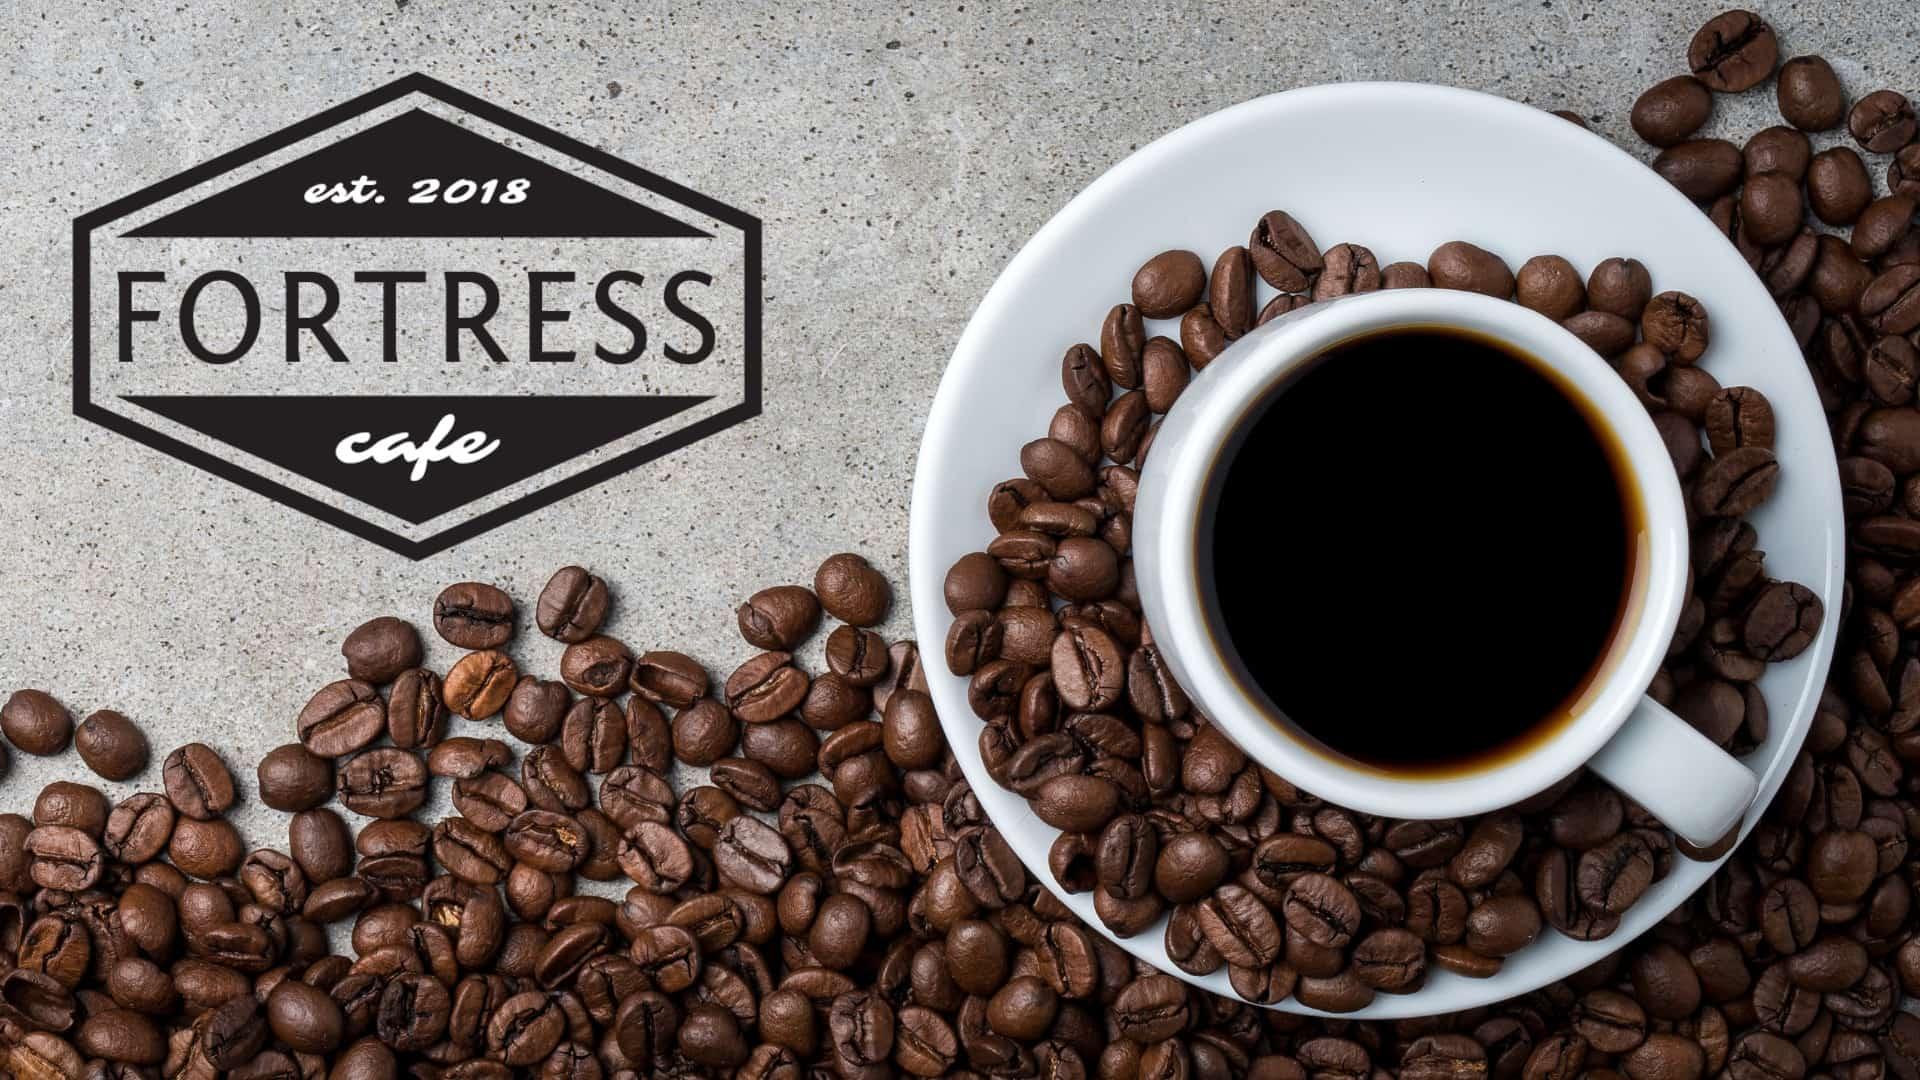 Fortress Coffee - Jackson Michigan